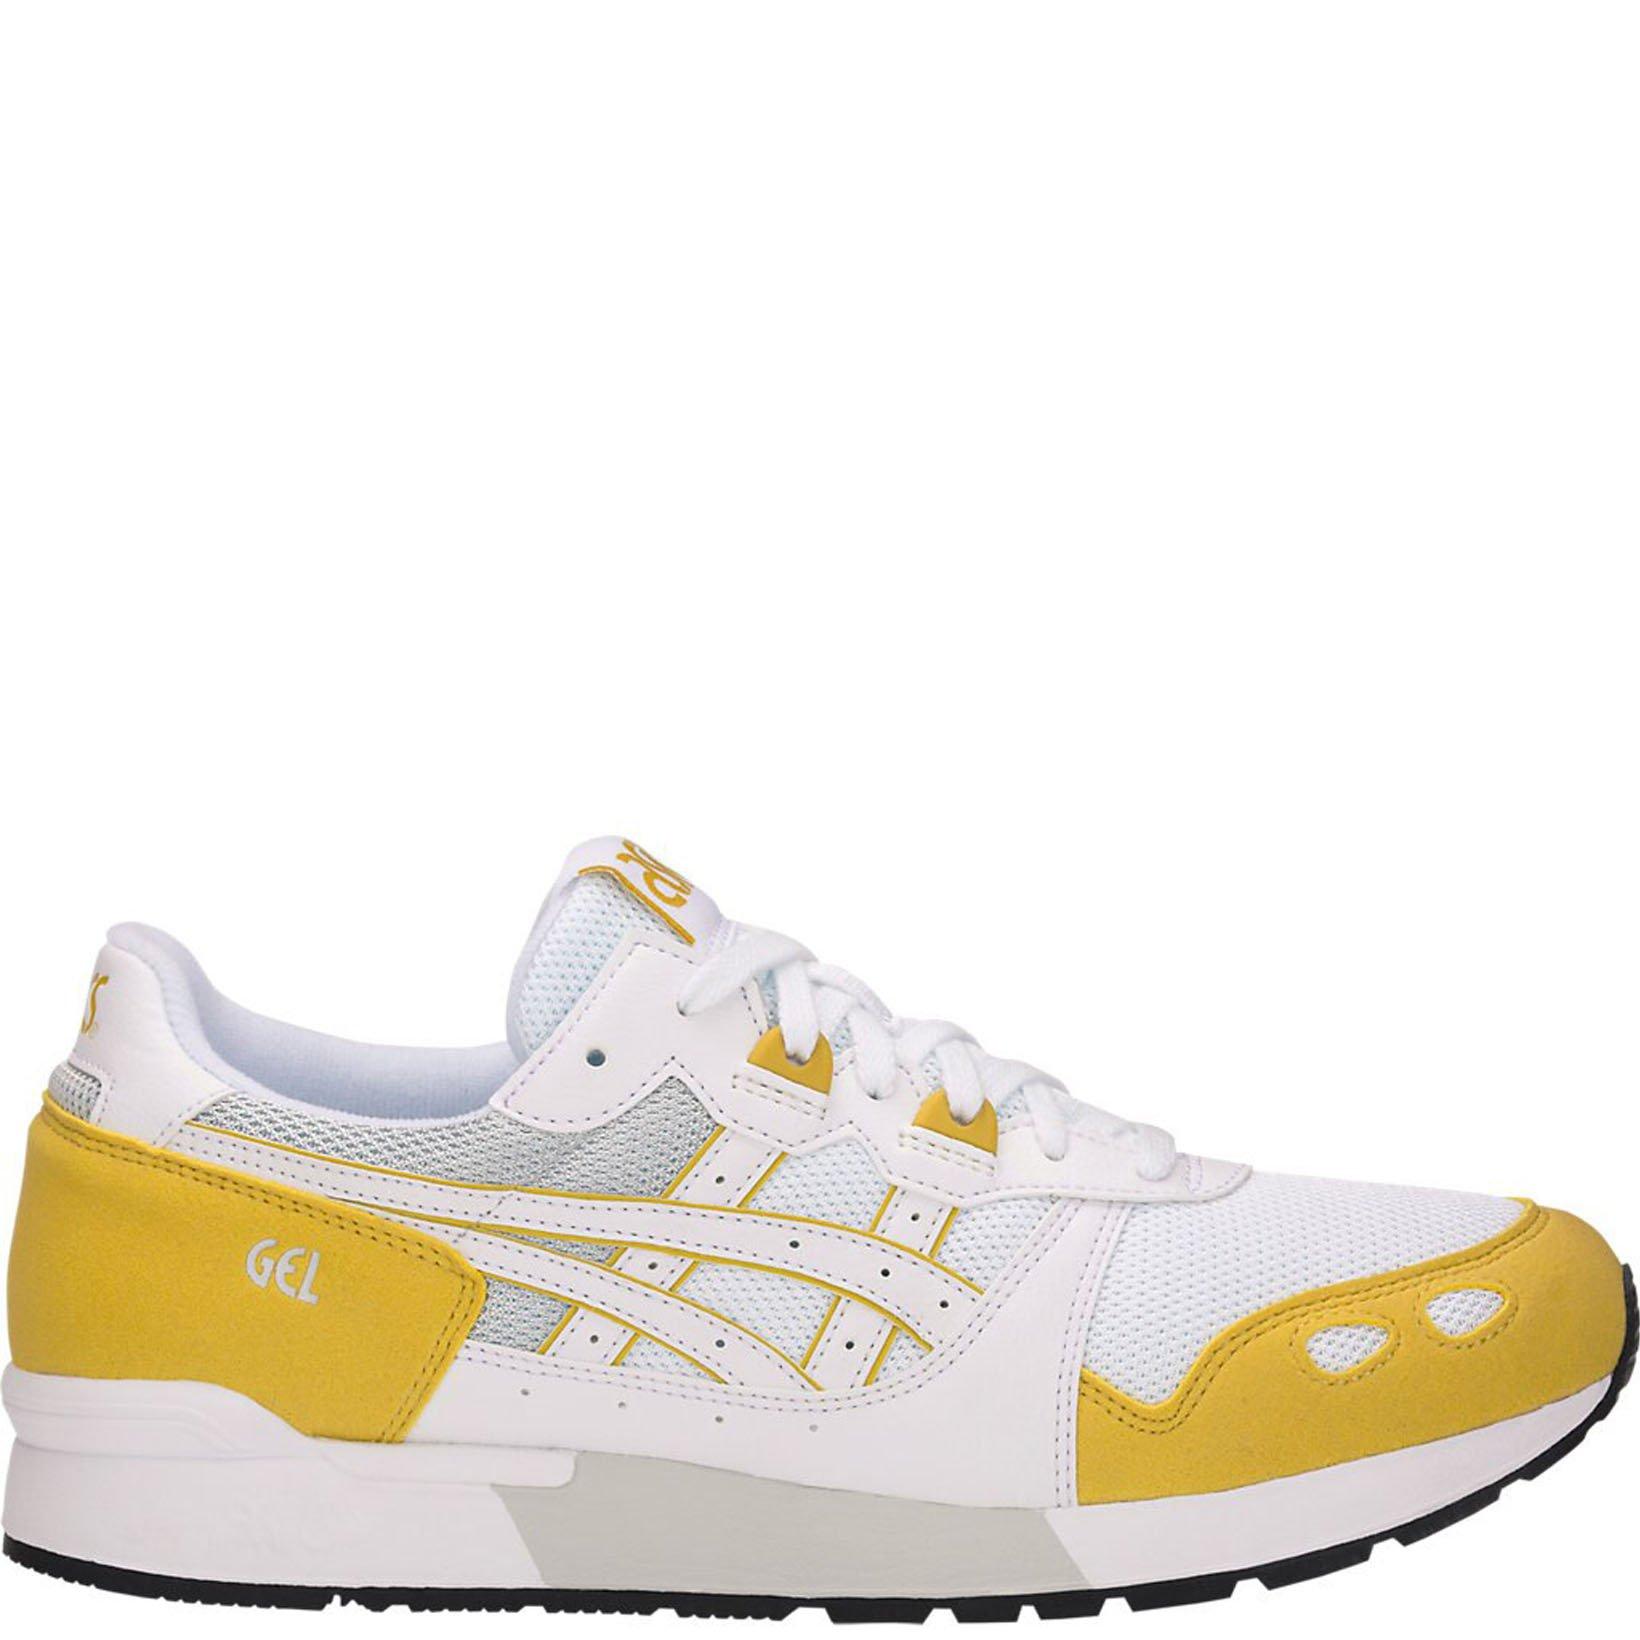 Кроссовки Asics Gel-Lyte, white/yellow, 37.5 RU фото